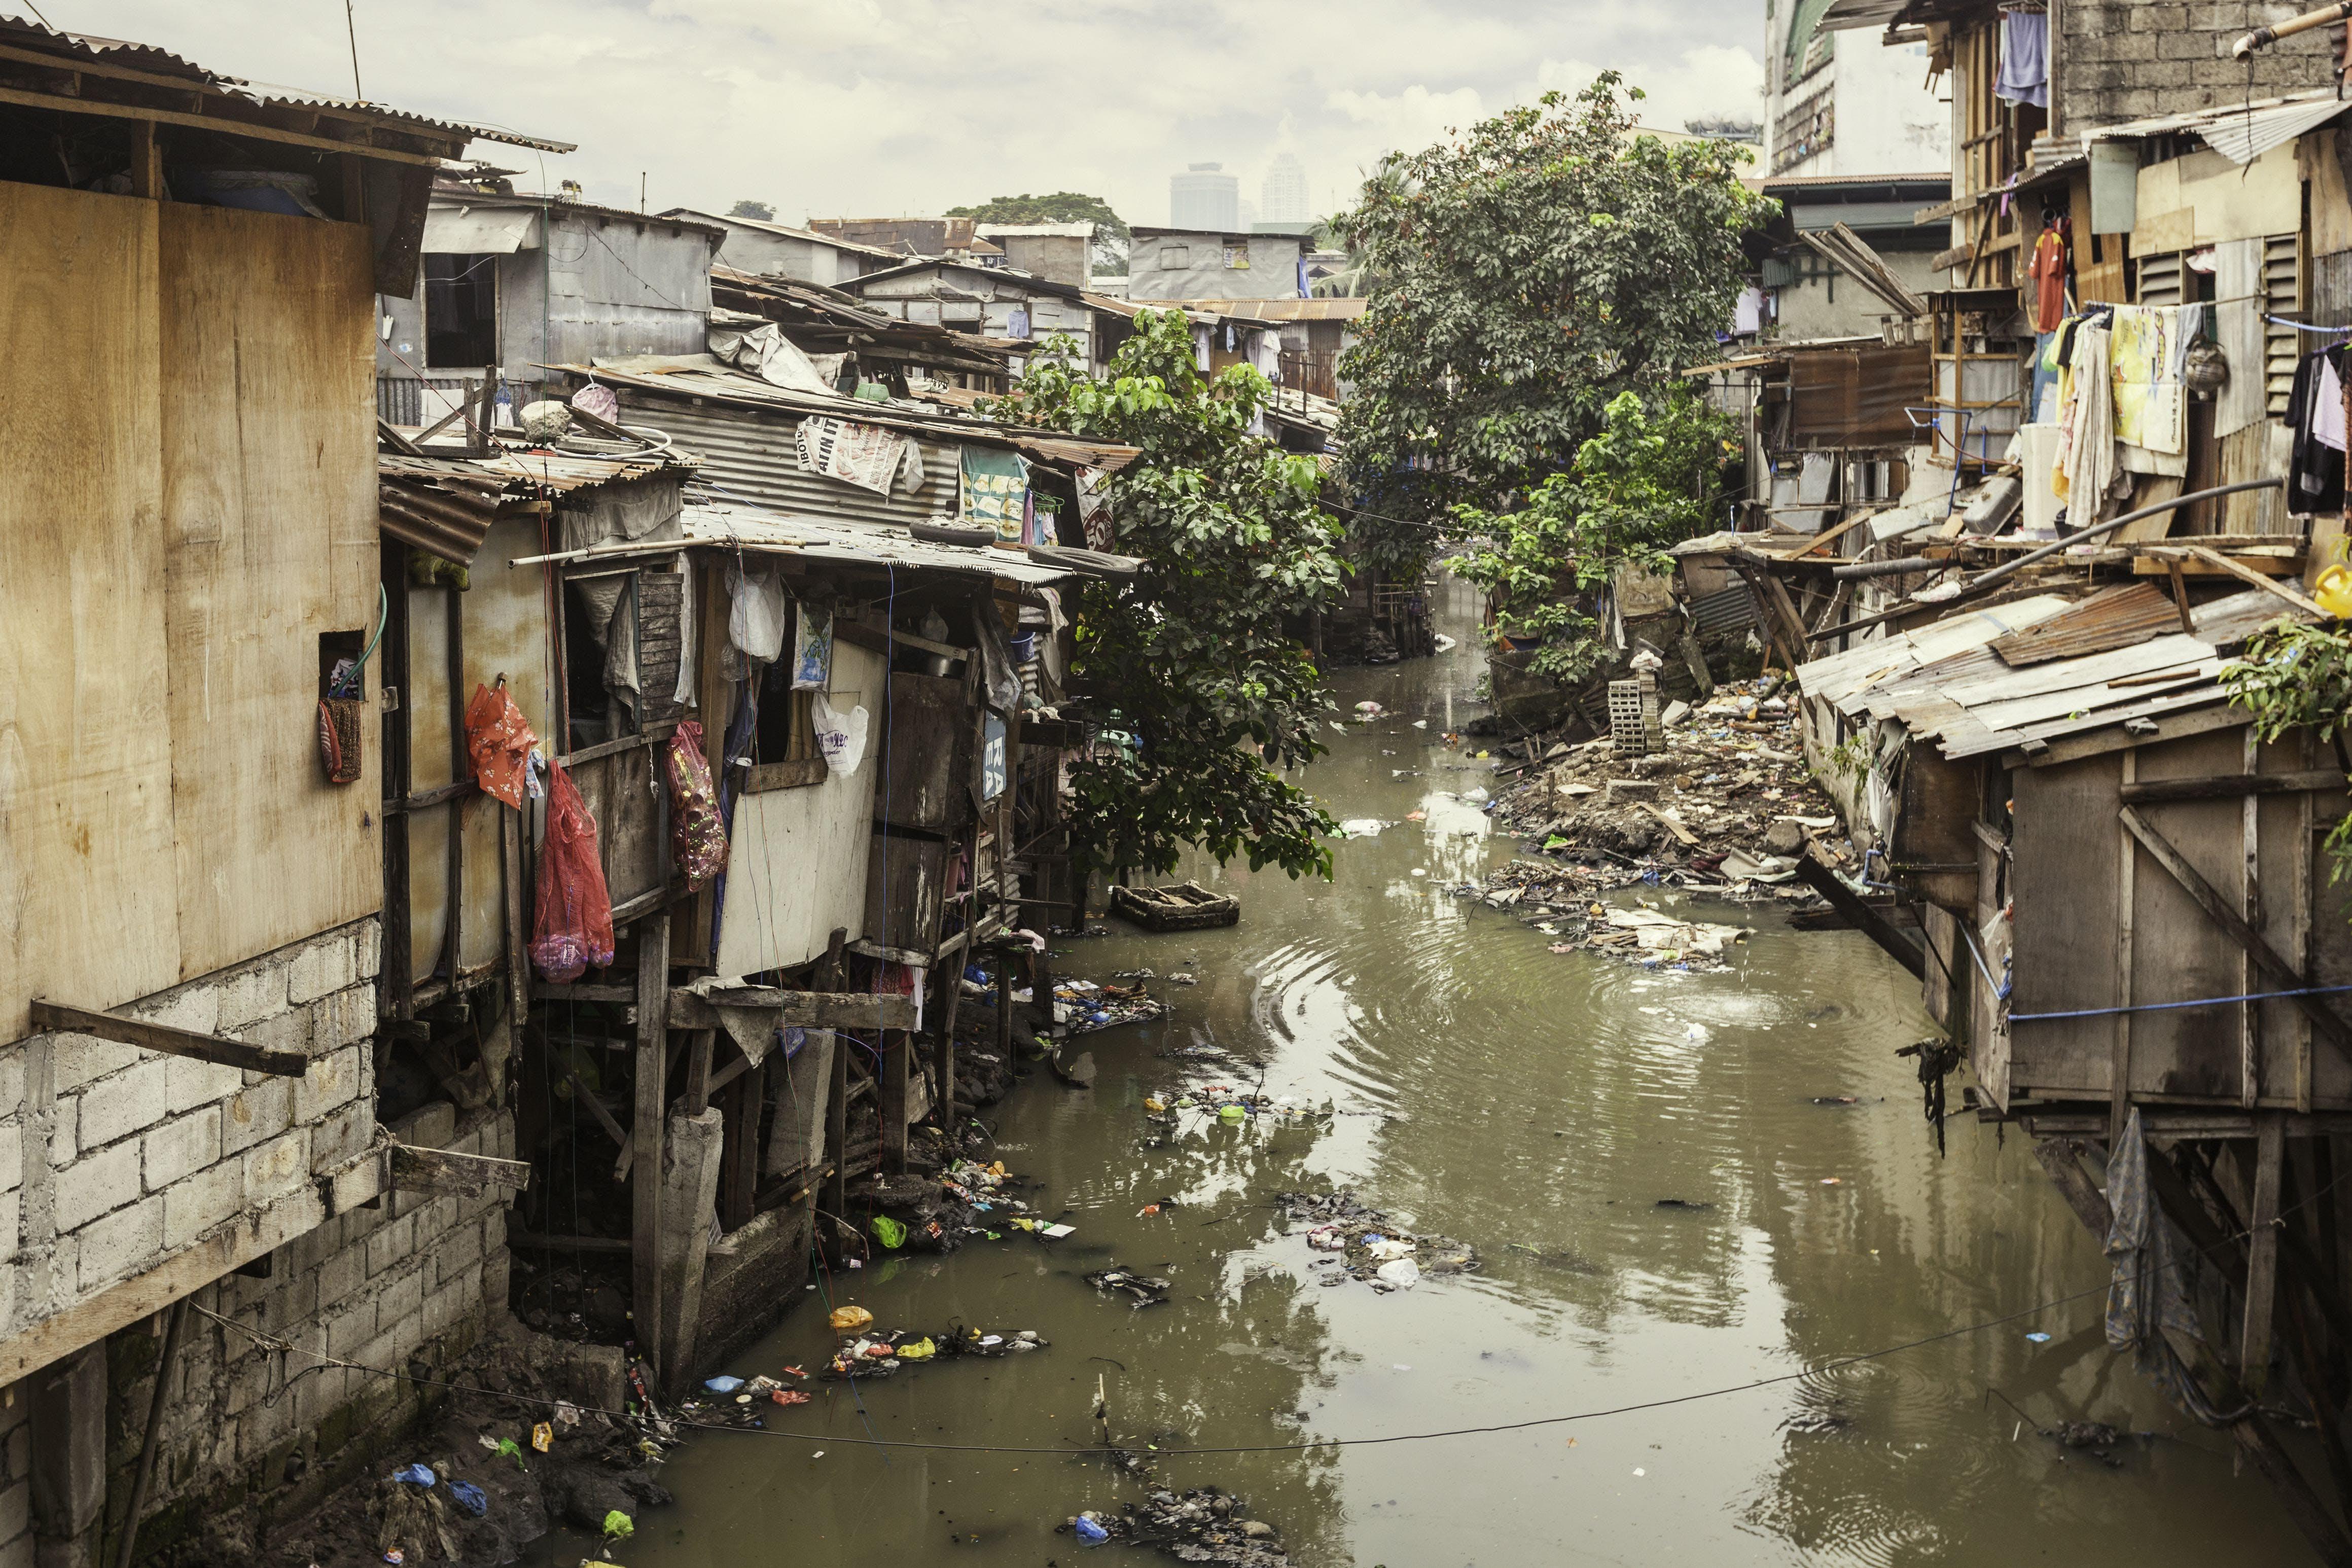 Duterte war on drugs in the Philippines